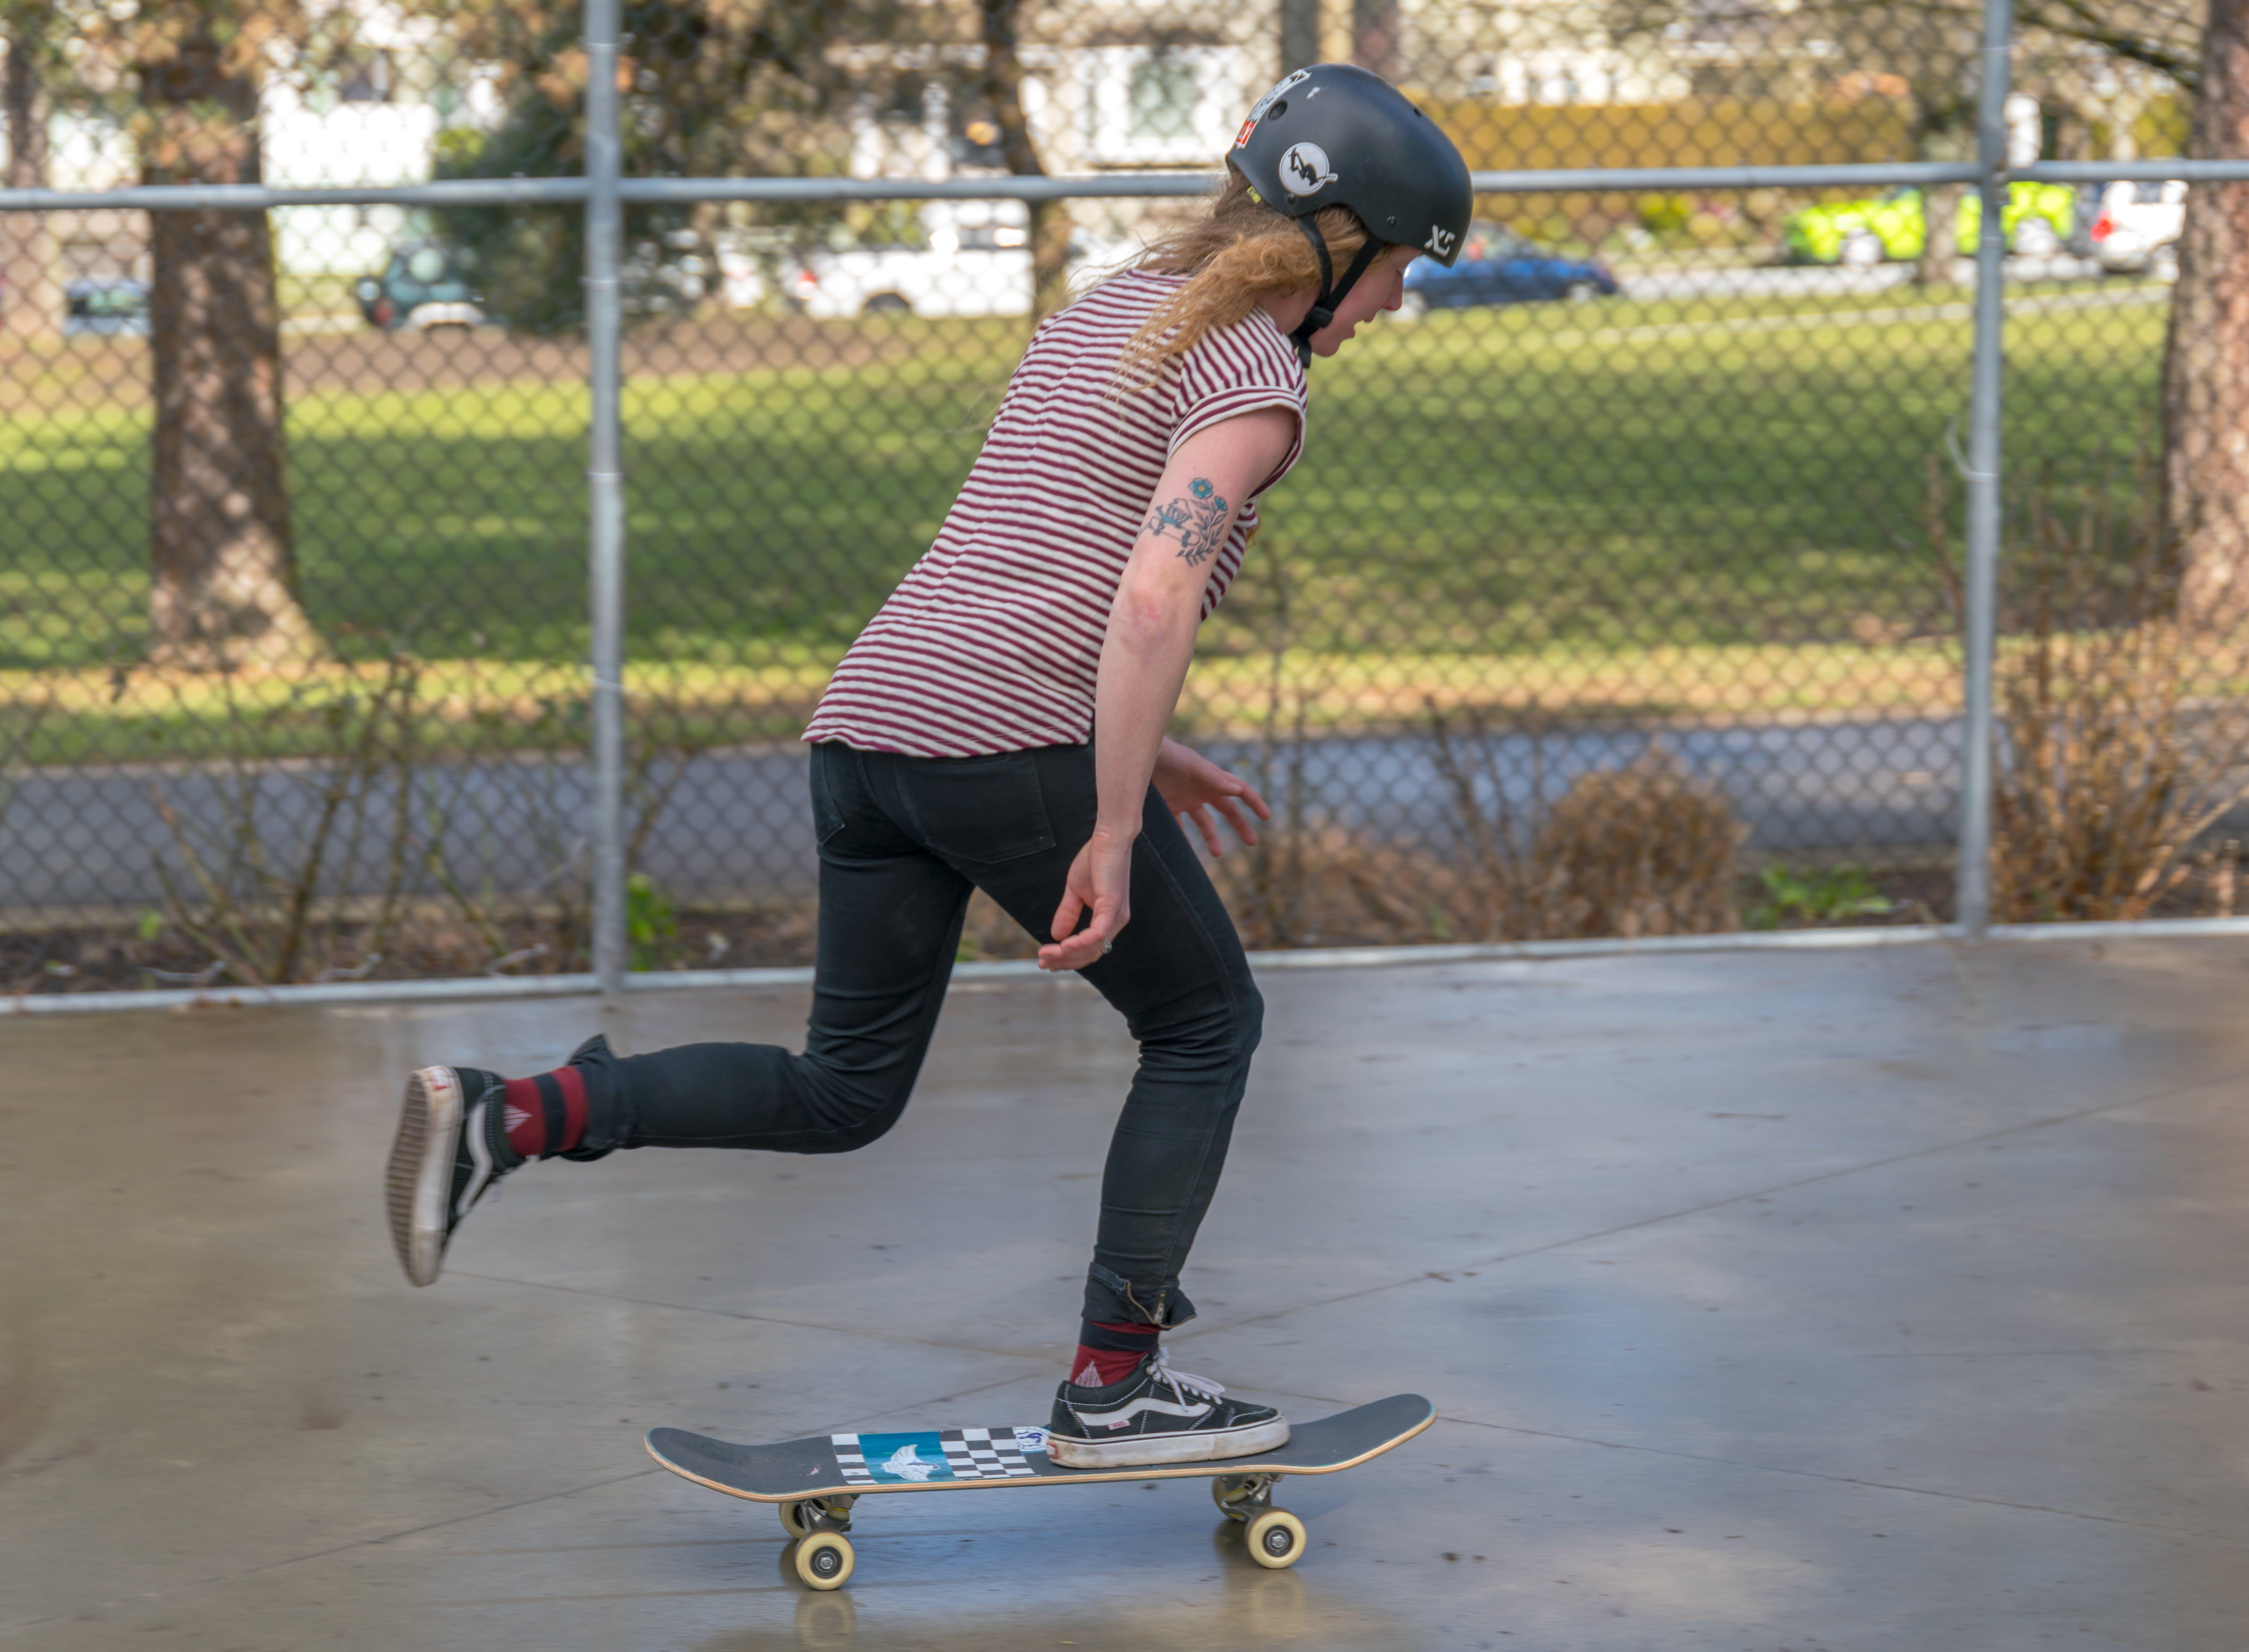 Adult woman skateboarding